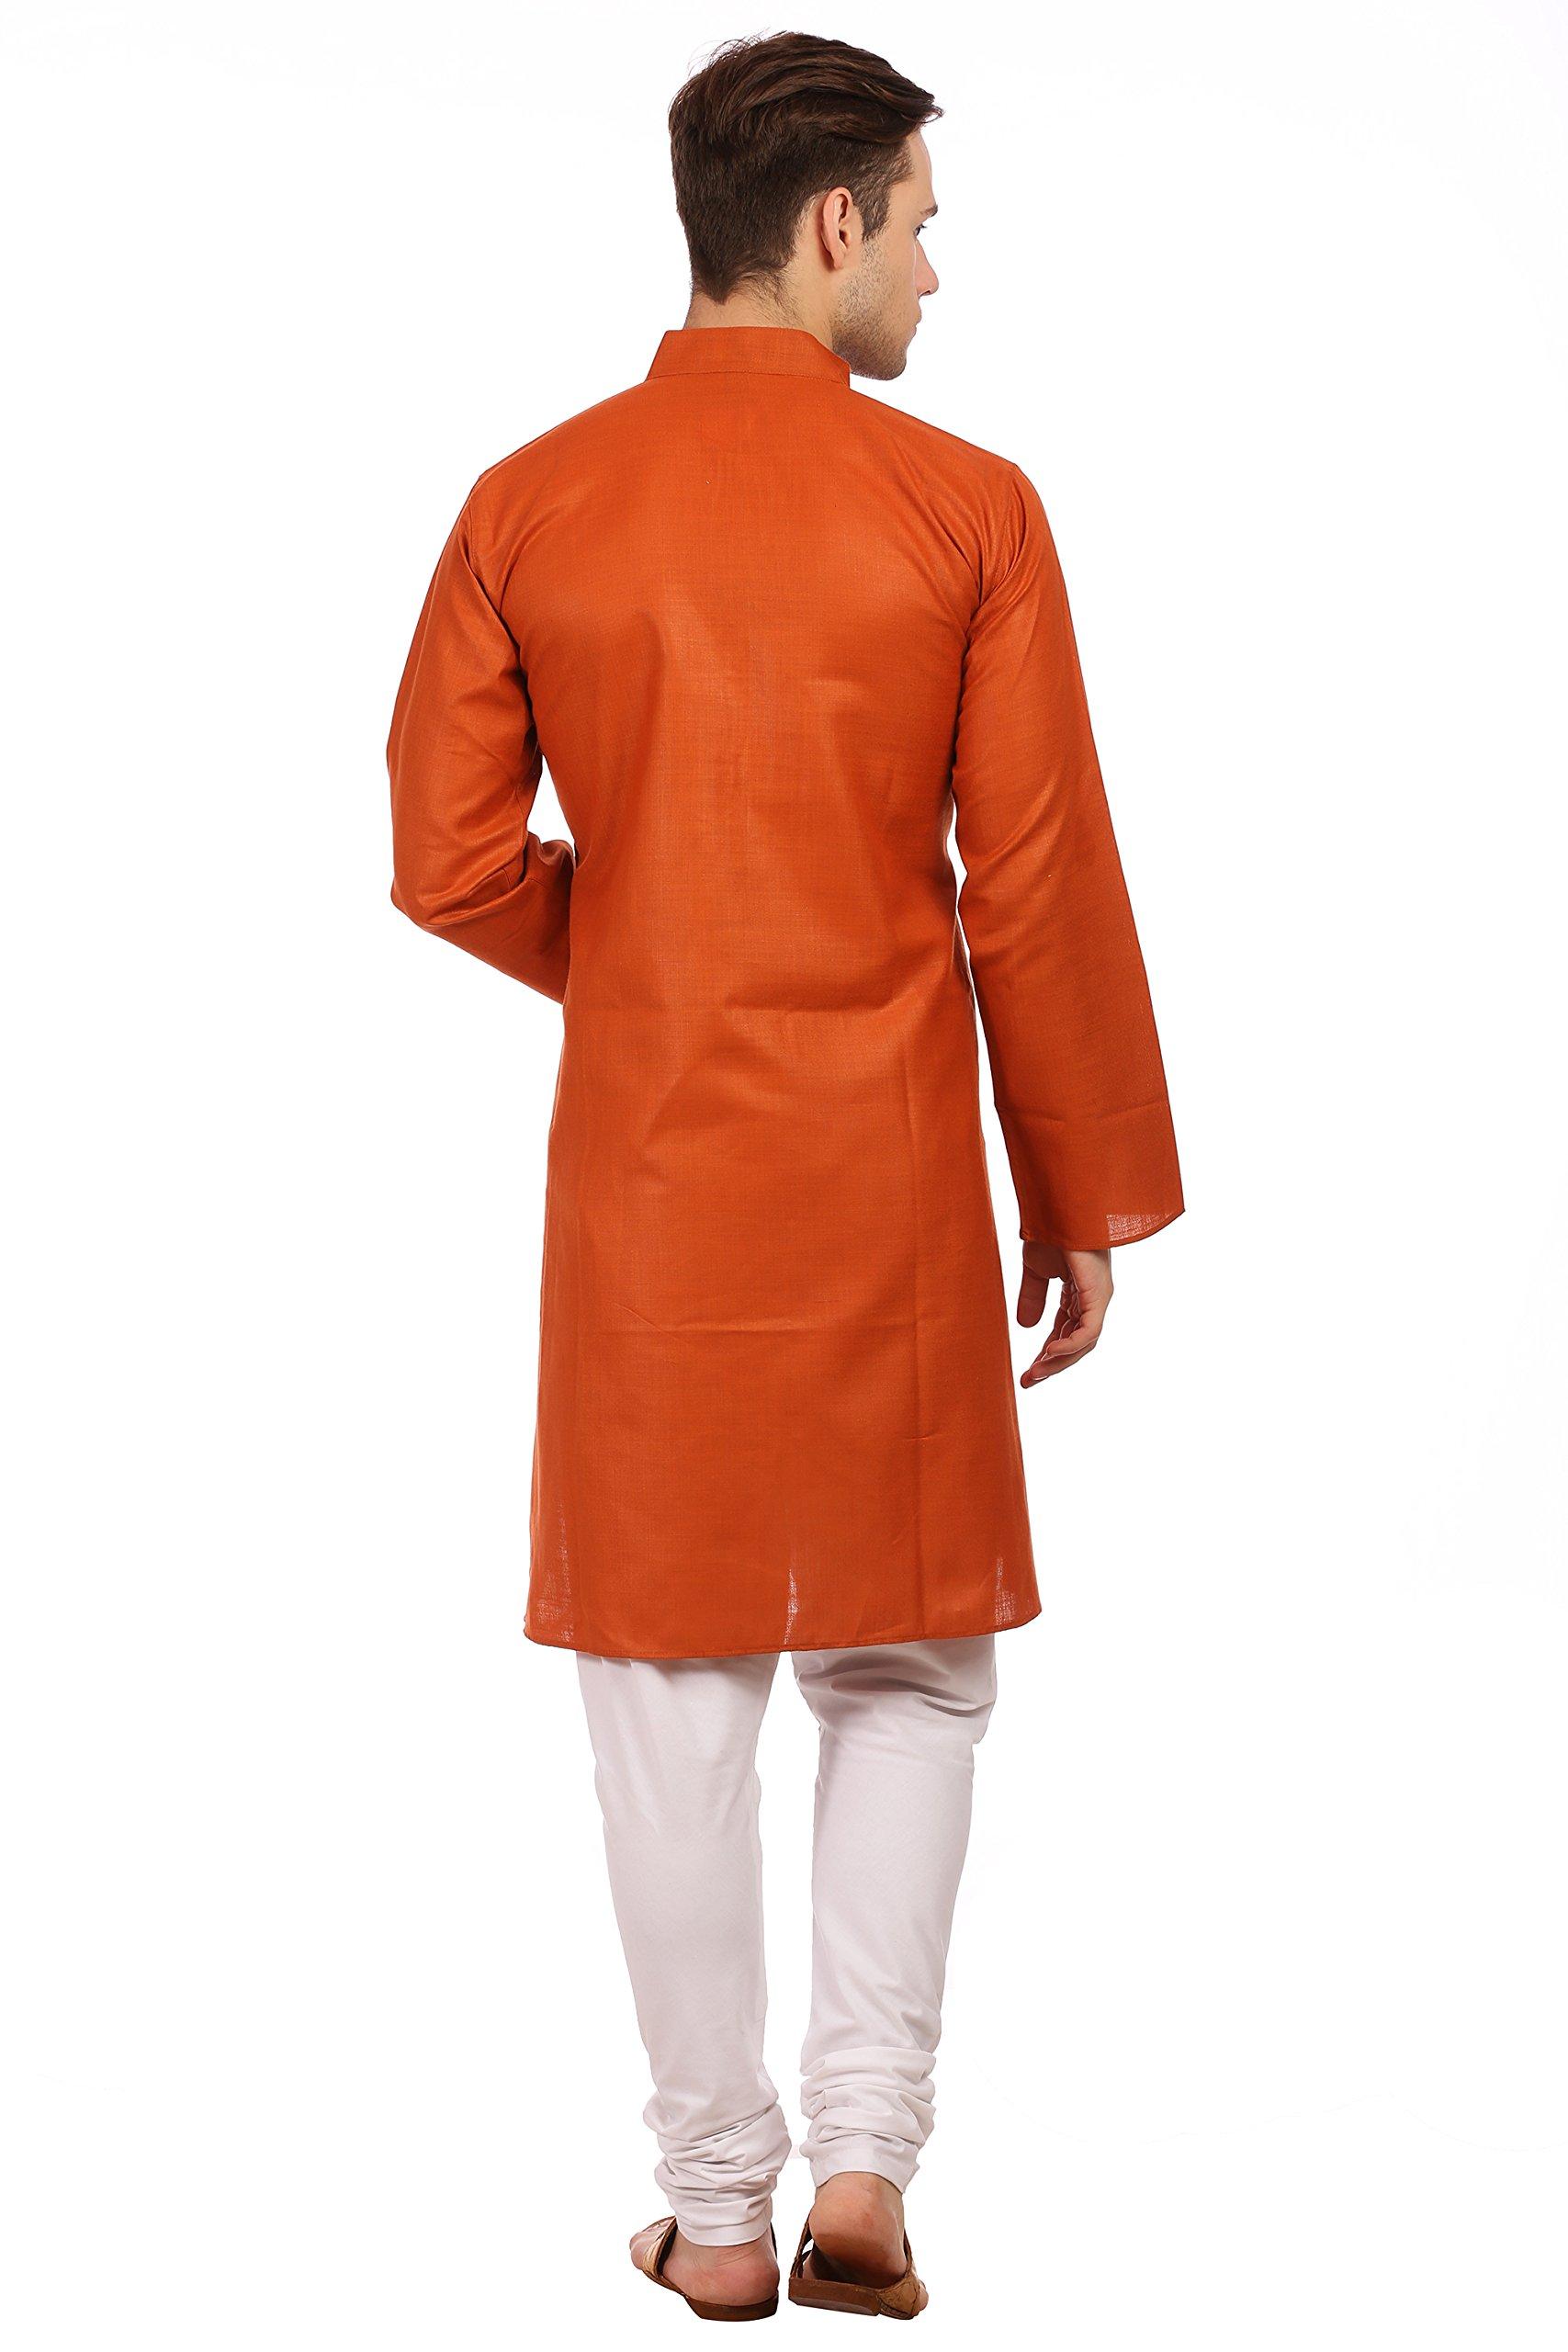 Wintage Men's Cotton Silk Festive and Casual Red Kurta Pyjama by WINTAGE (Image #4)